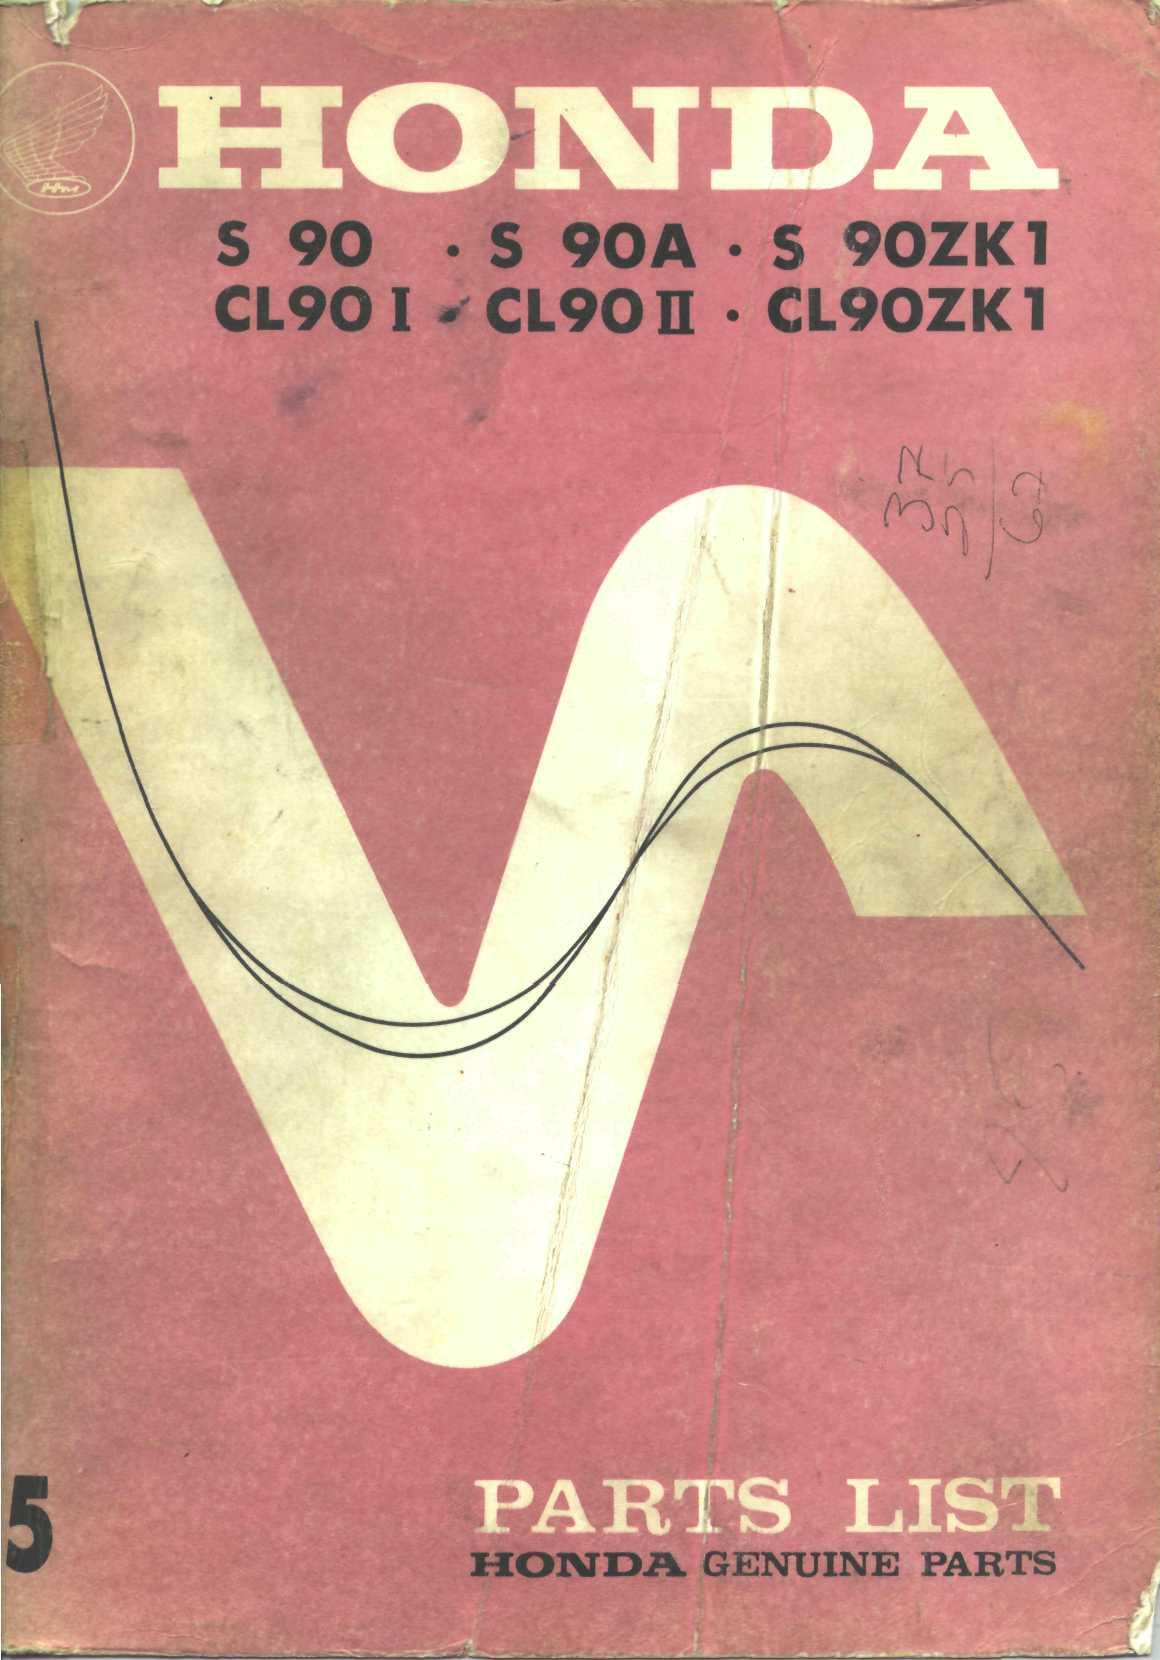 Workshopmanual for Honda CL90 (1972)